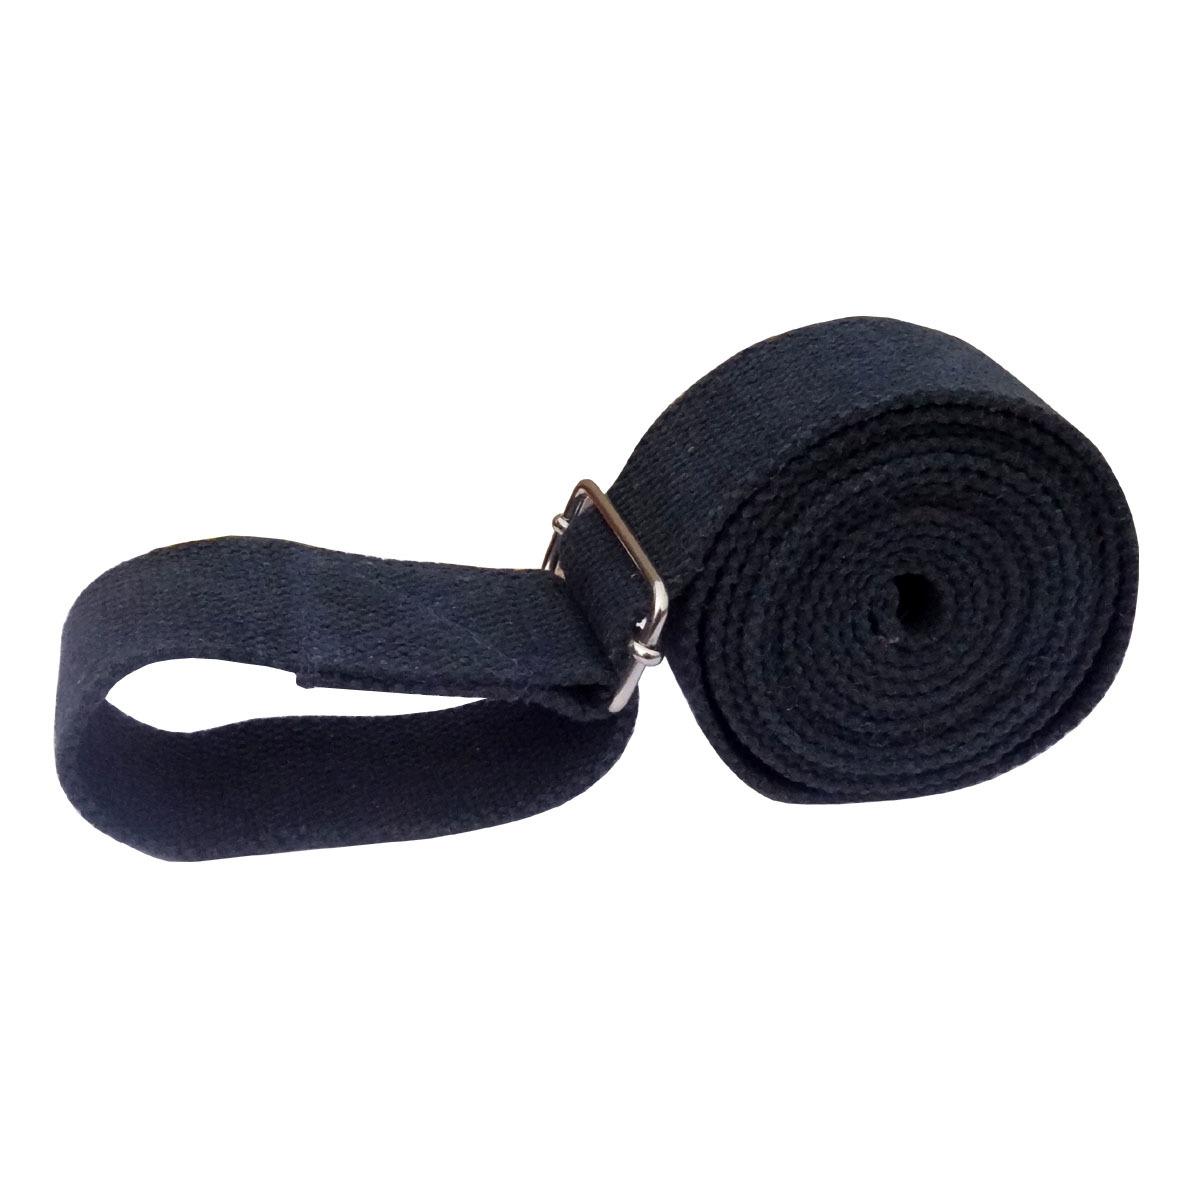 Yoga Strap/Belt